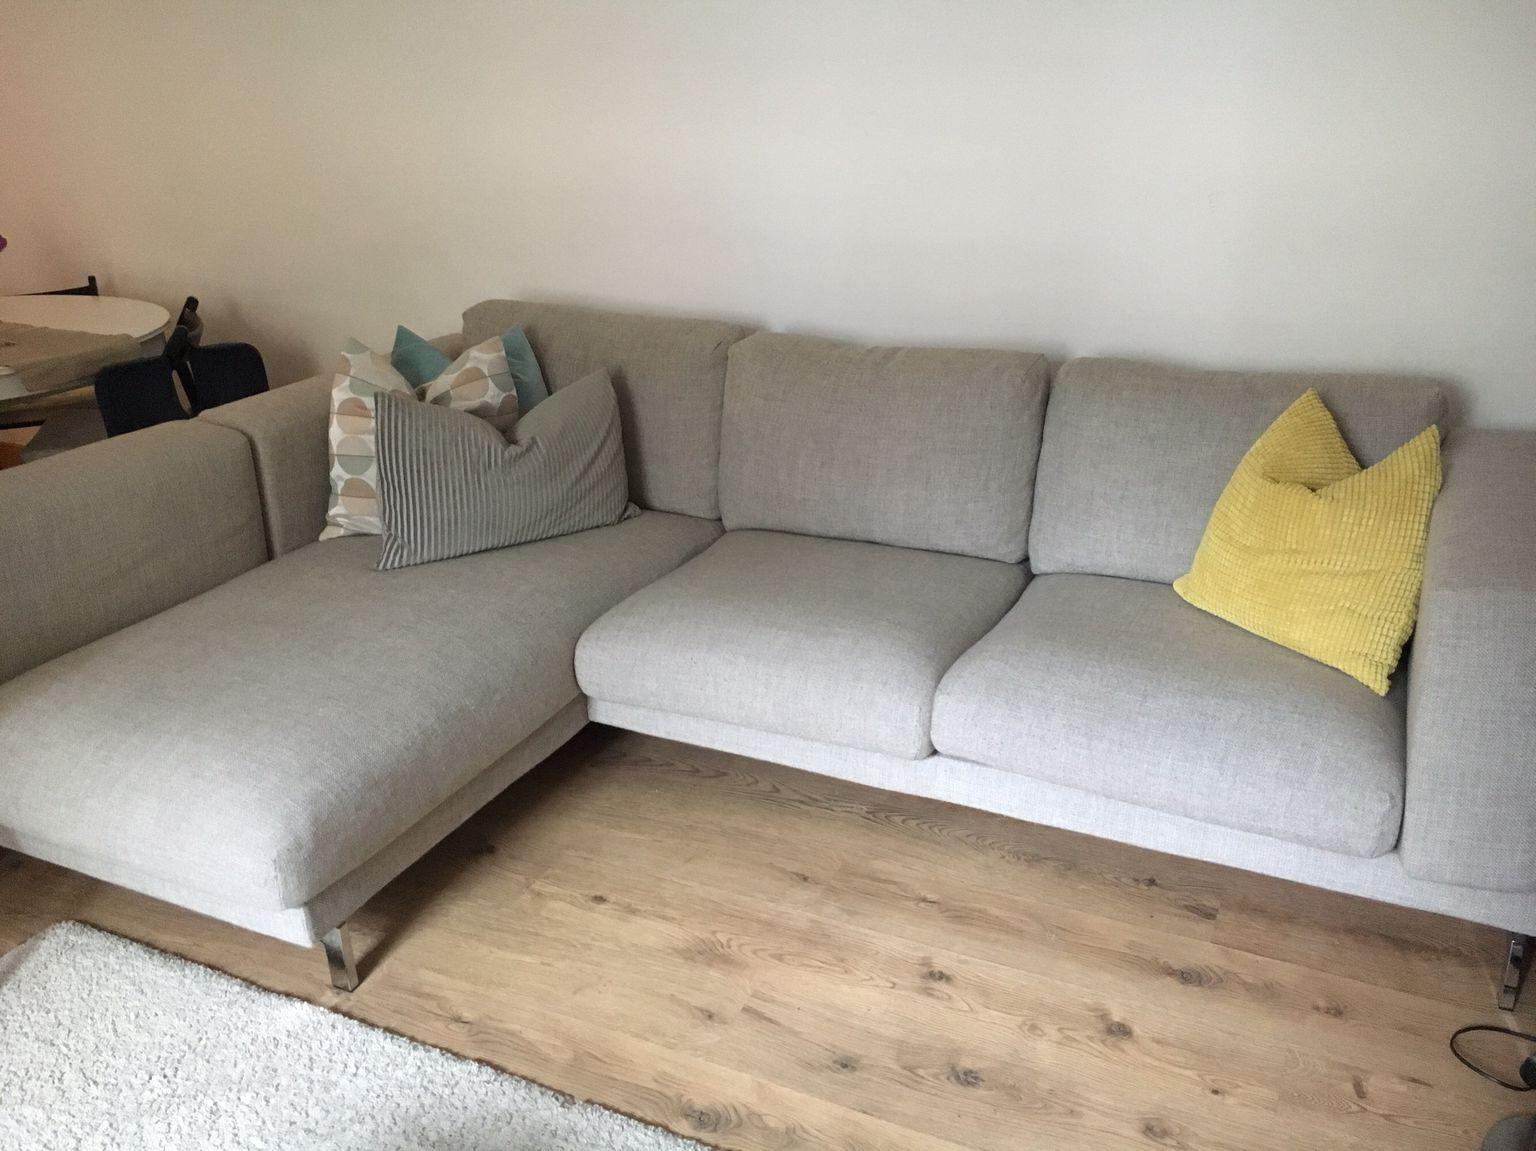 Sofa Nockeby D0dg Used Ikea Nockeby Corner sofa In Wc1h London for 495 00 Shpock